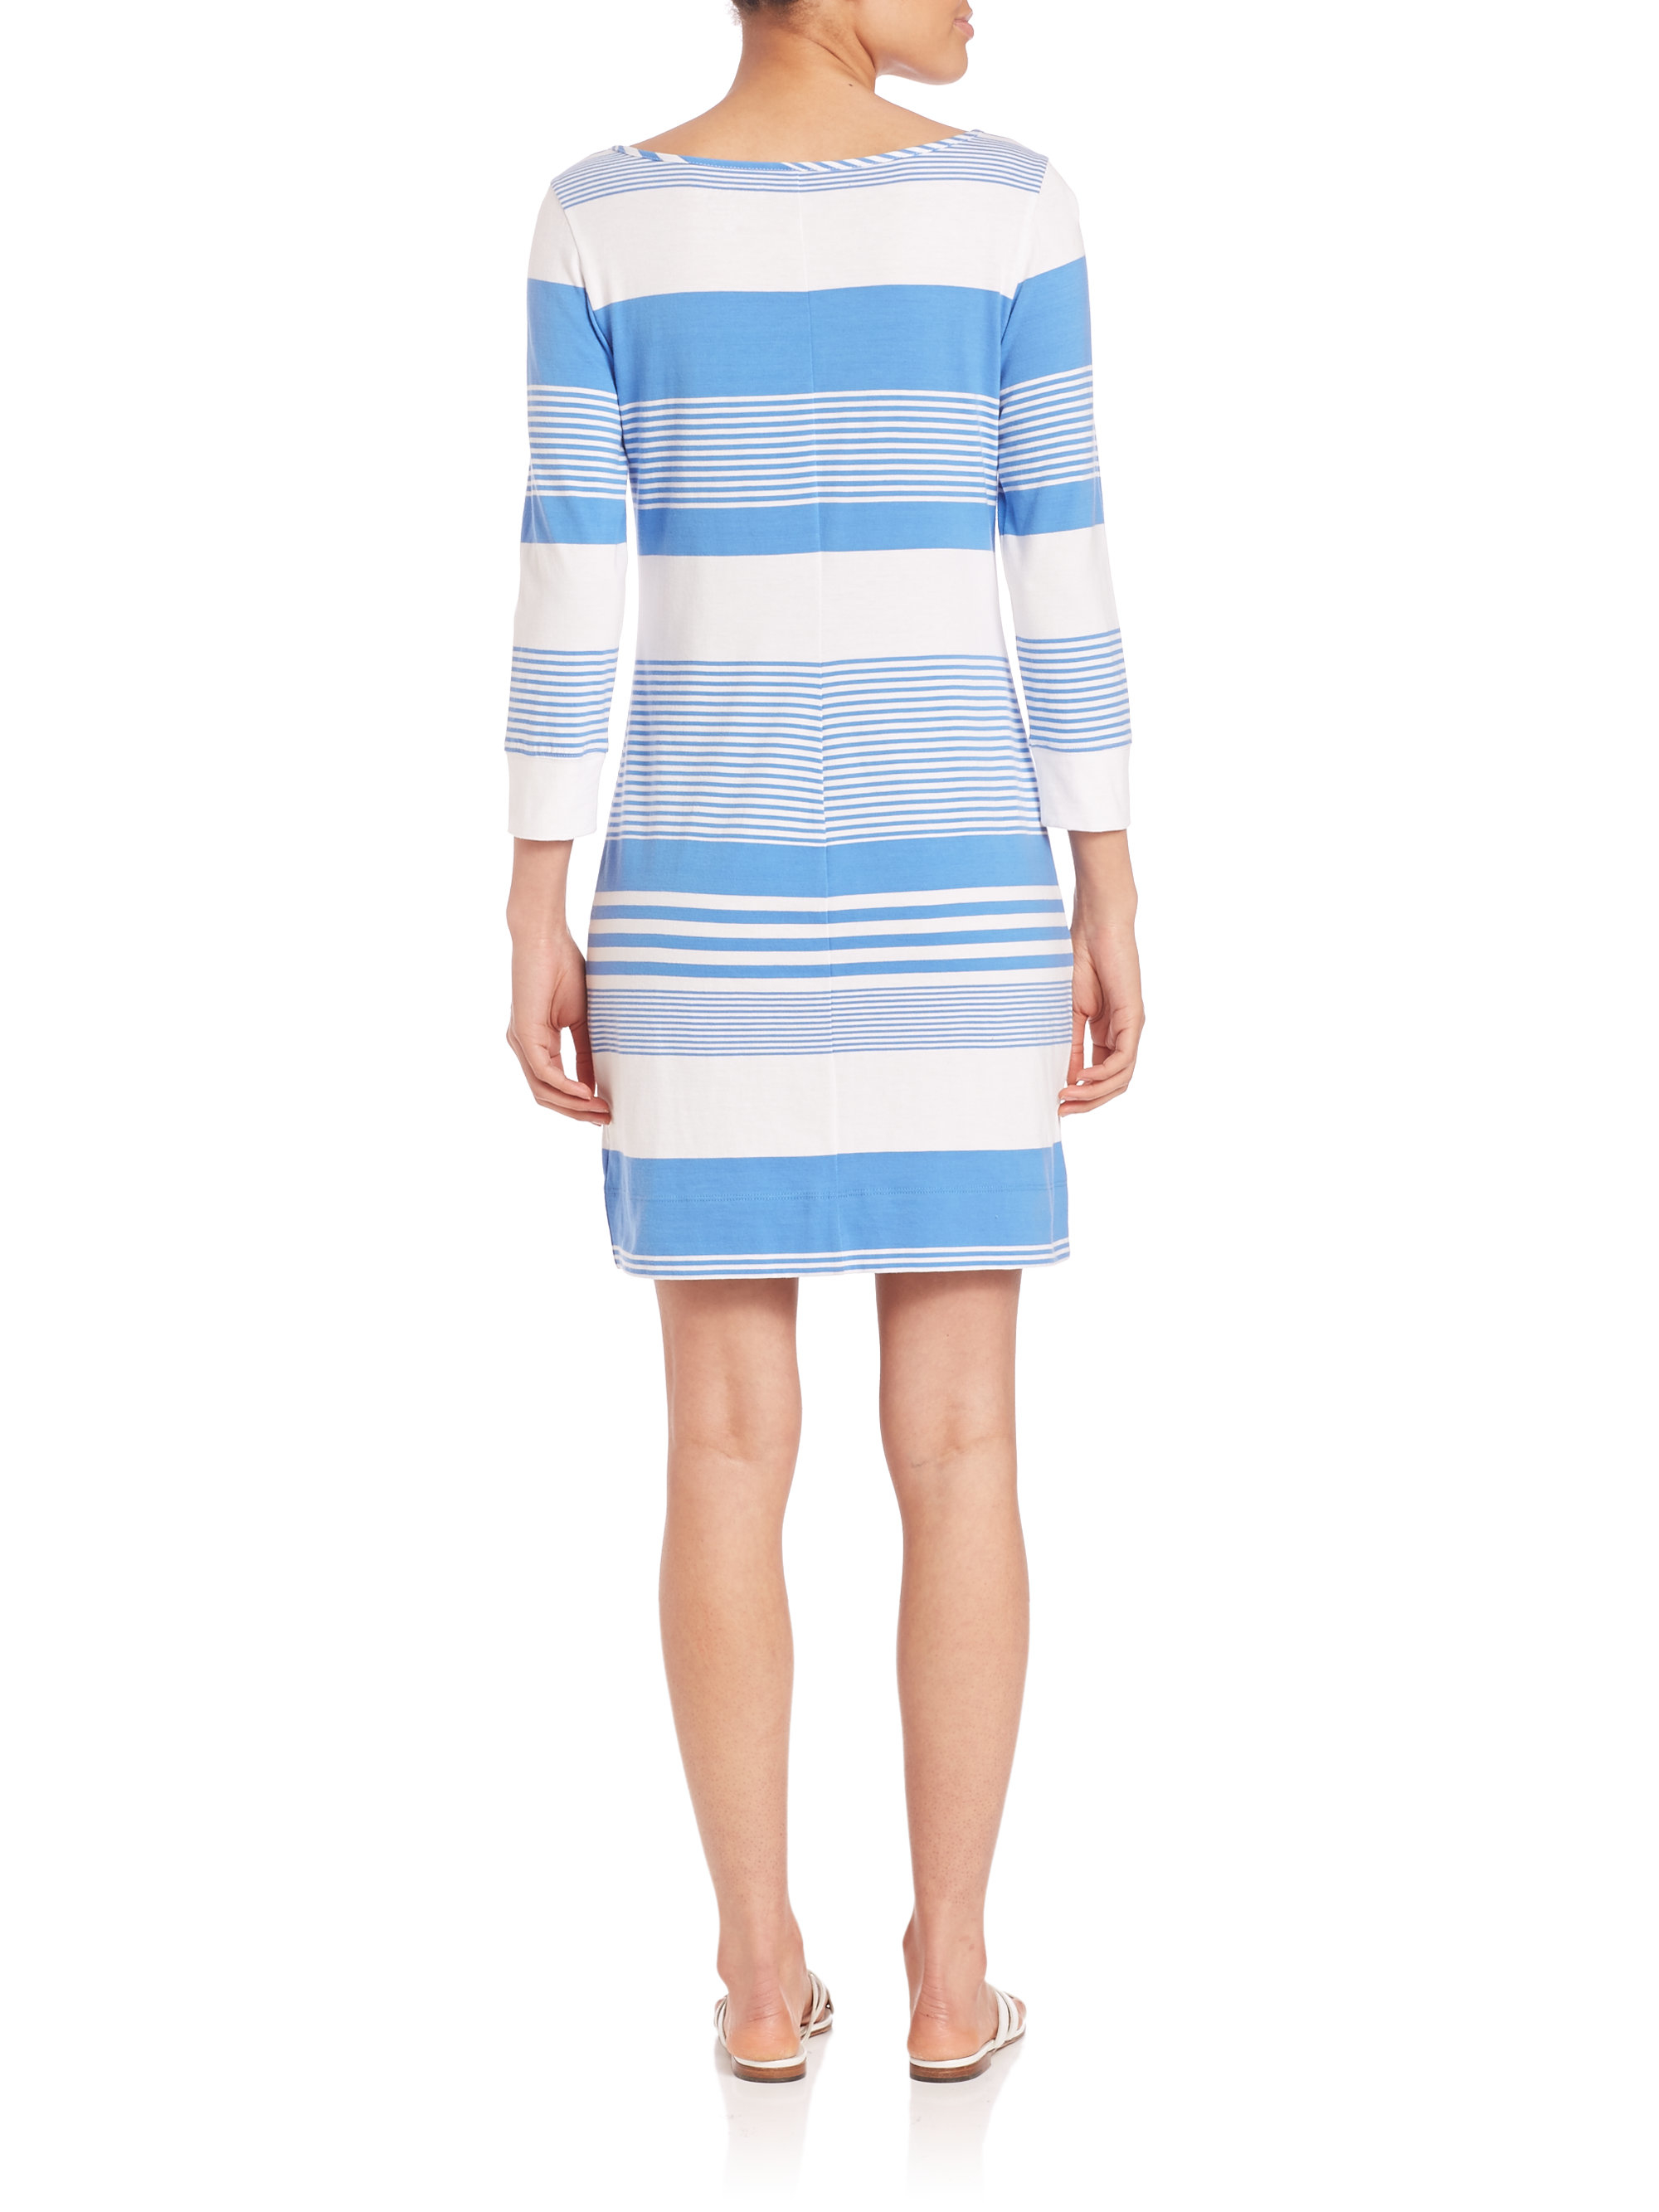 Lilly pulitzer Marlowe Pima Cotton Striped Dress in Blue ...